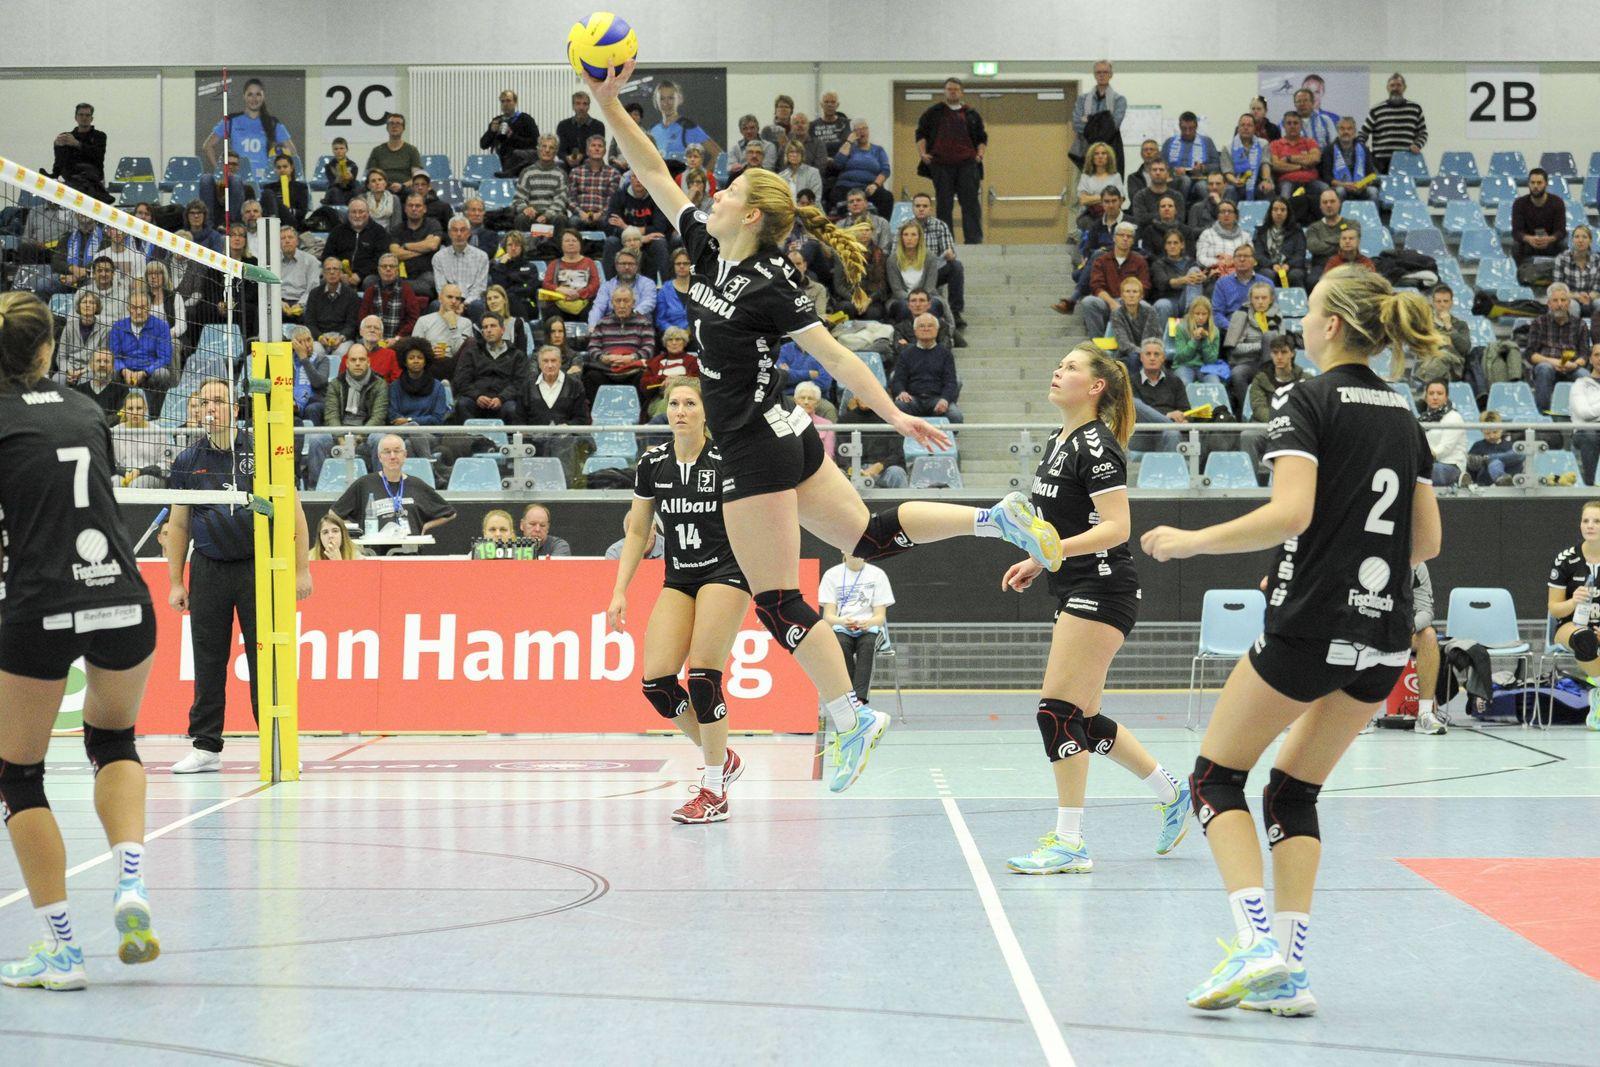 2 Volleyball Bundesliga Nord Volleyball Team Hamburg vs VC Allbau Essen Hamburg 18 11 17 Sandra